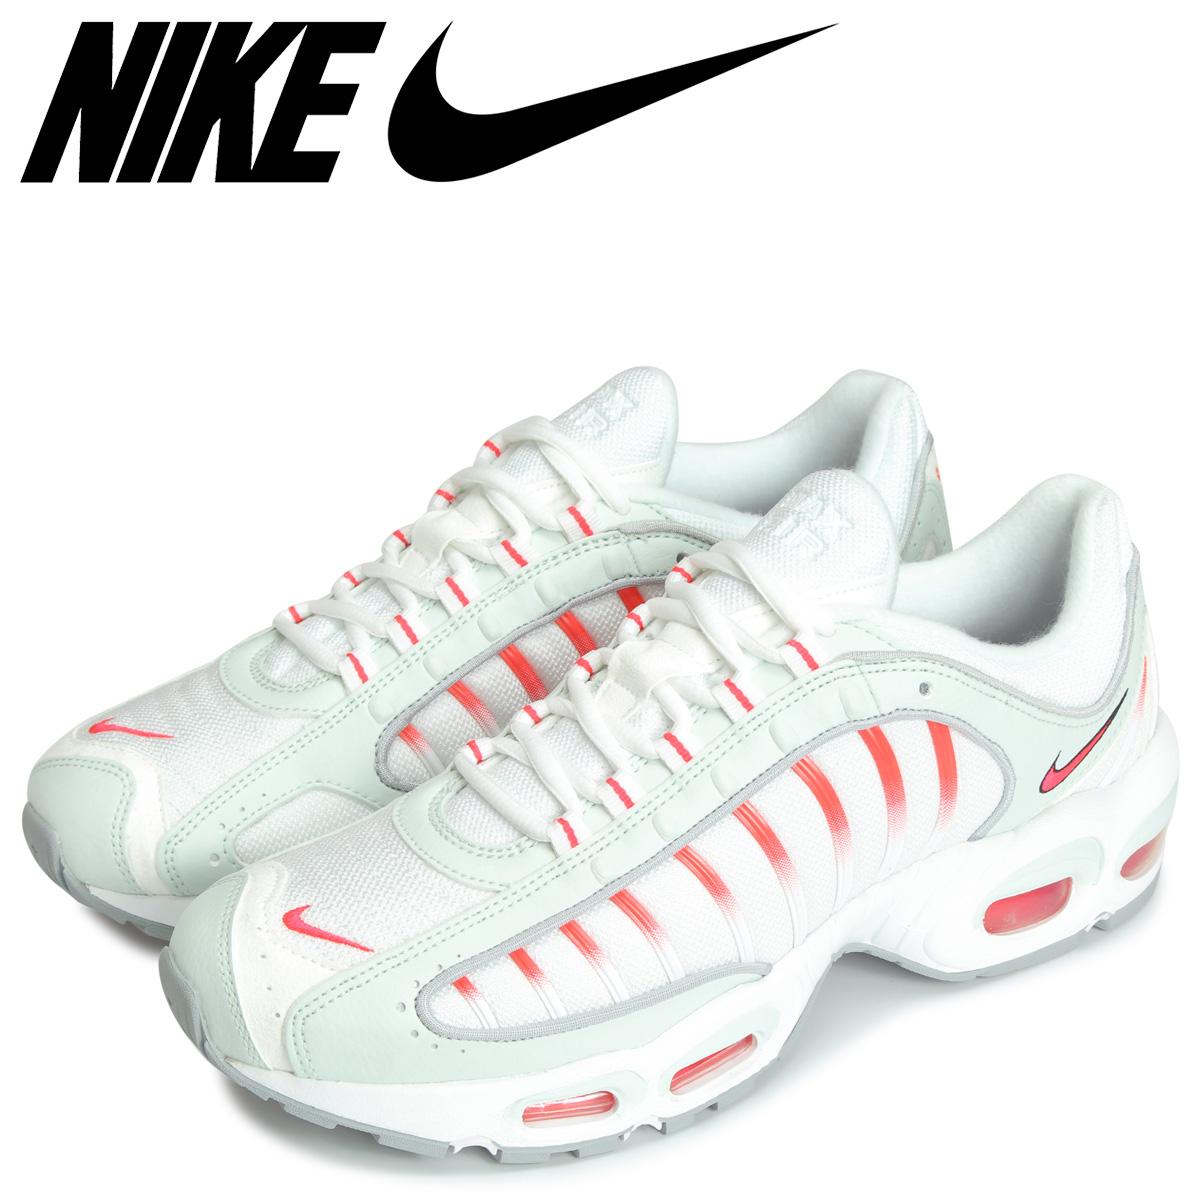 NIKE Kie Ney AMAX tale wind 4 sneakers men AIR MAX TAILWIND 4 white white AQ2567 400